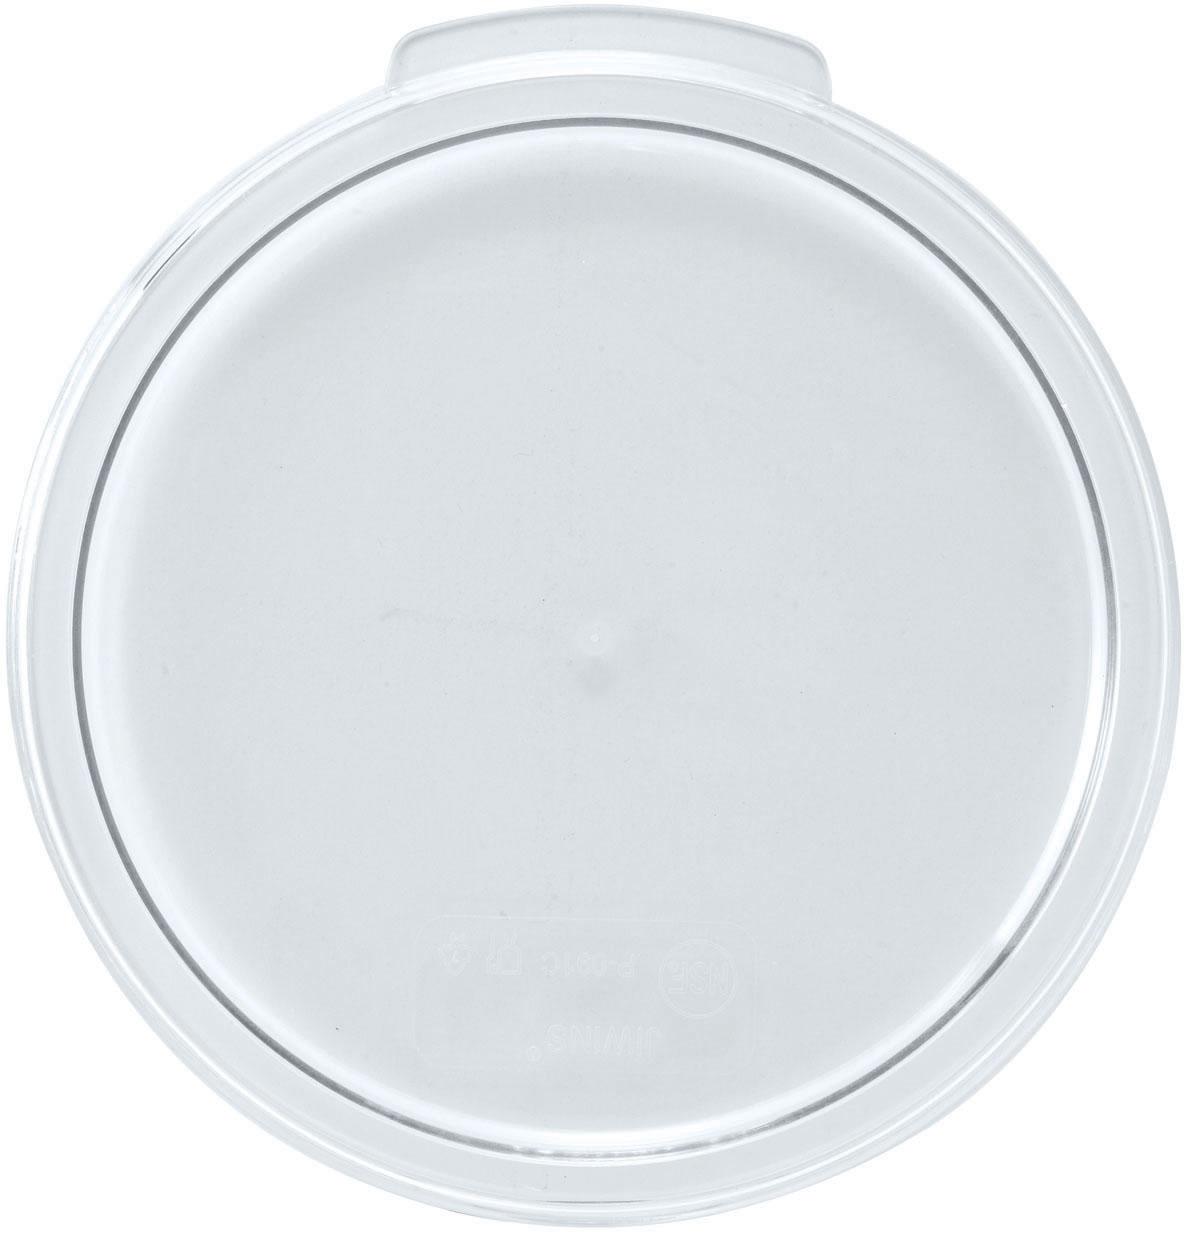 Winco PTRC-12 round food storage containers